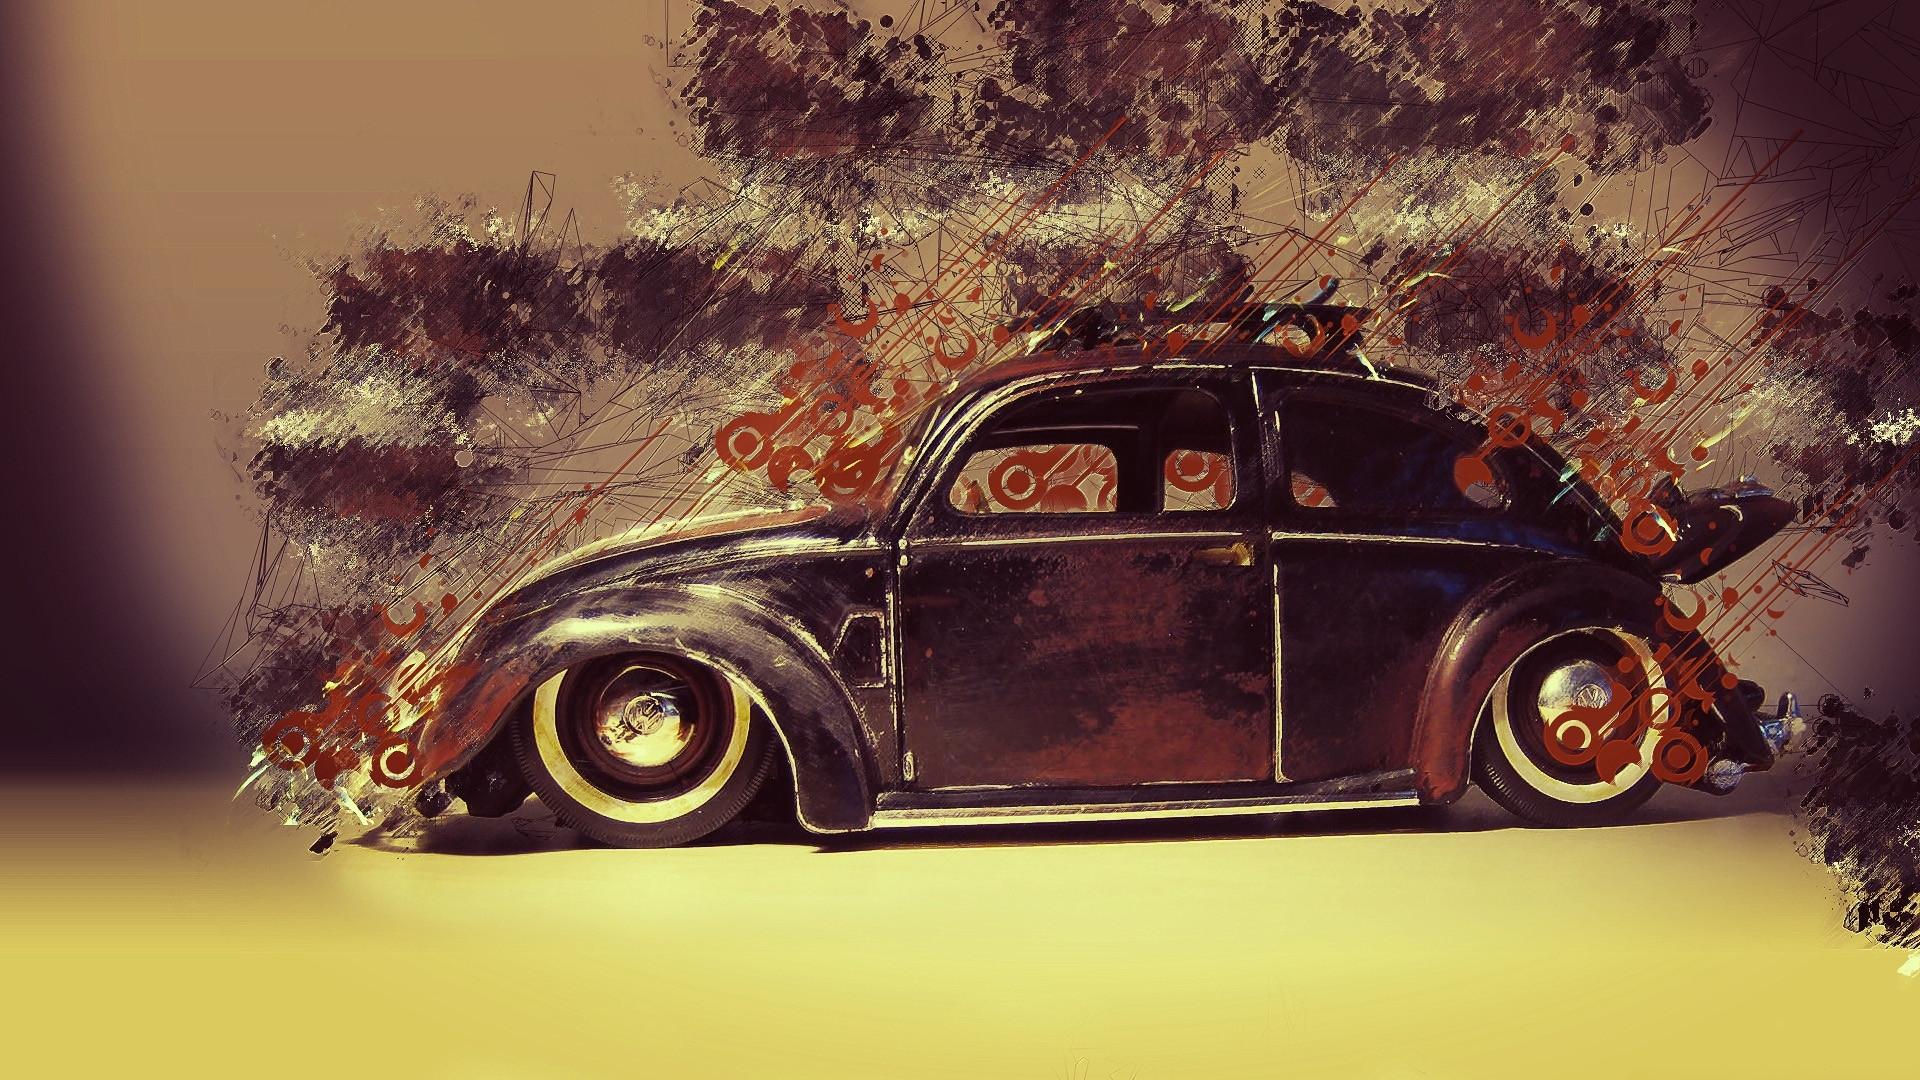 Cool VW Beetle Classic Wallpaper Wallpaper